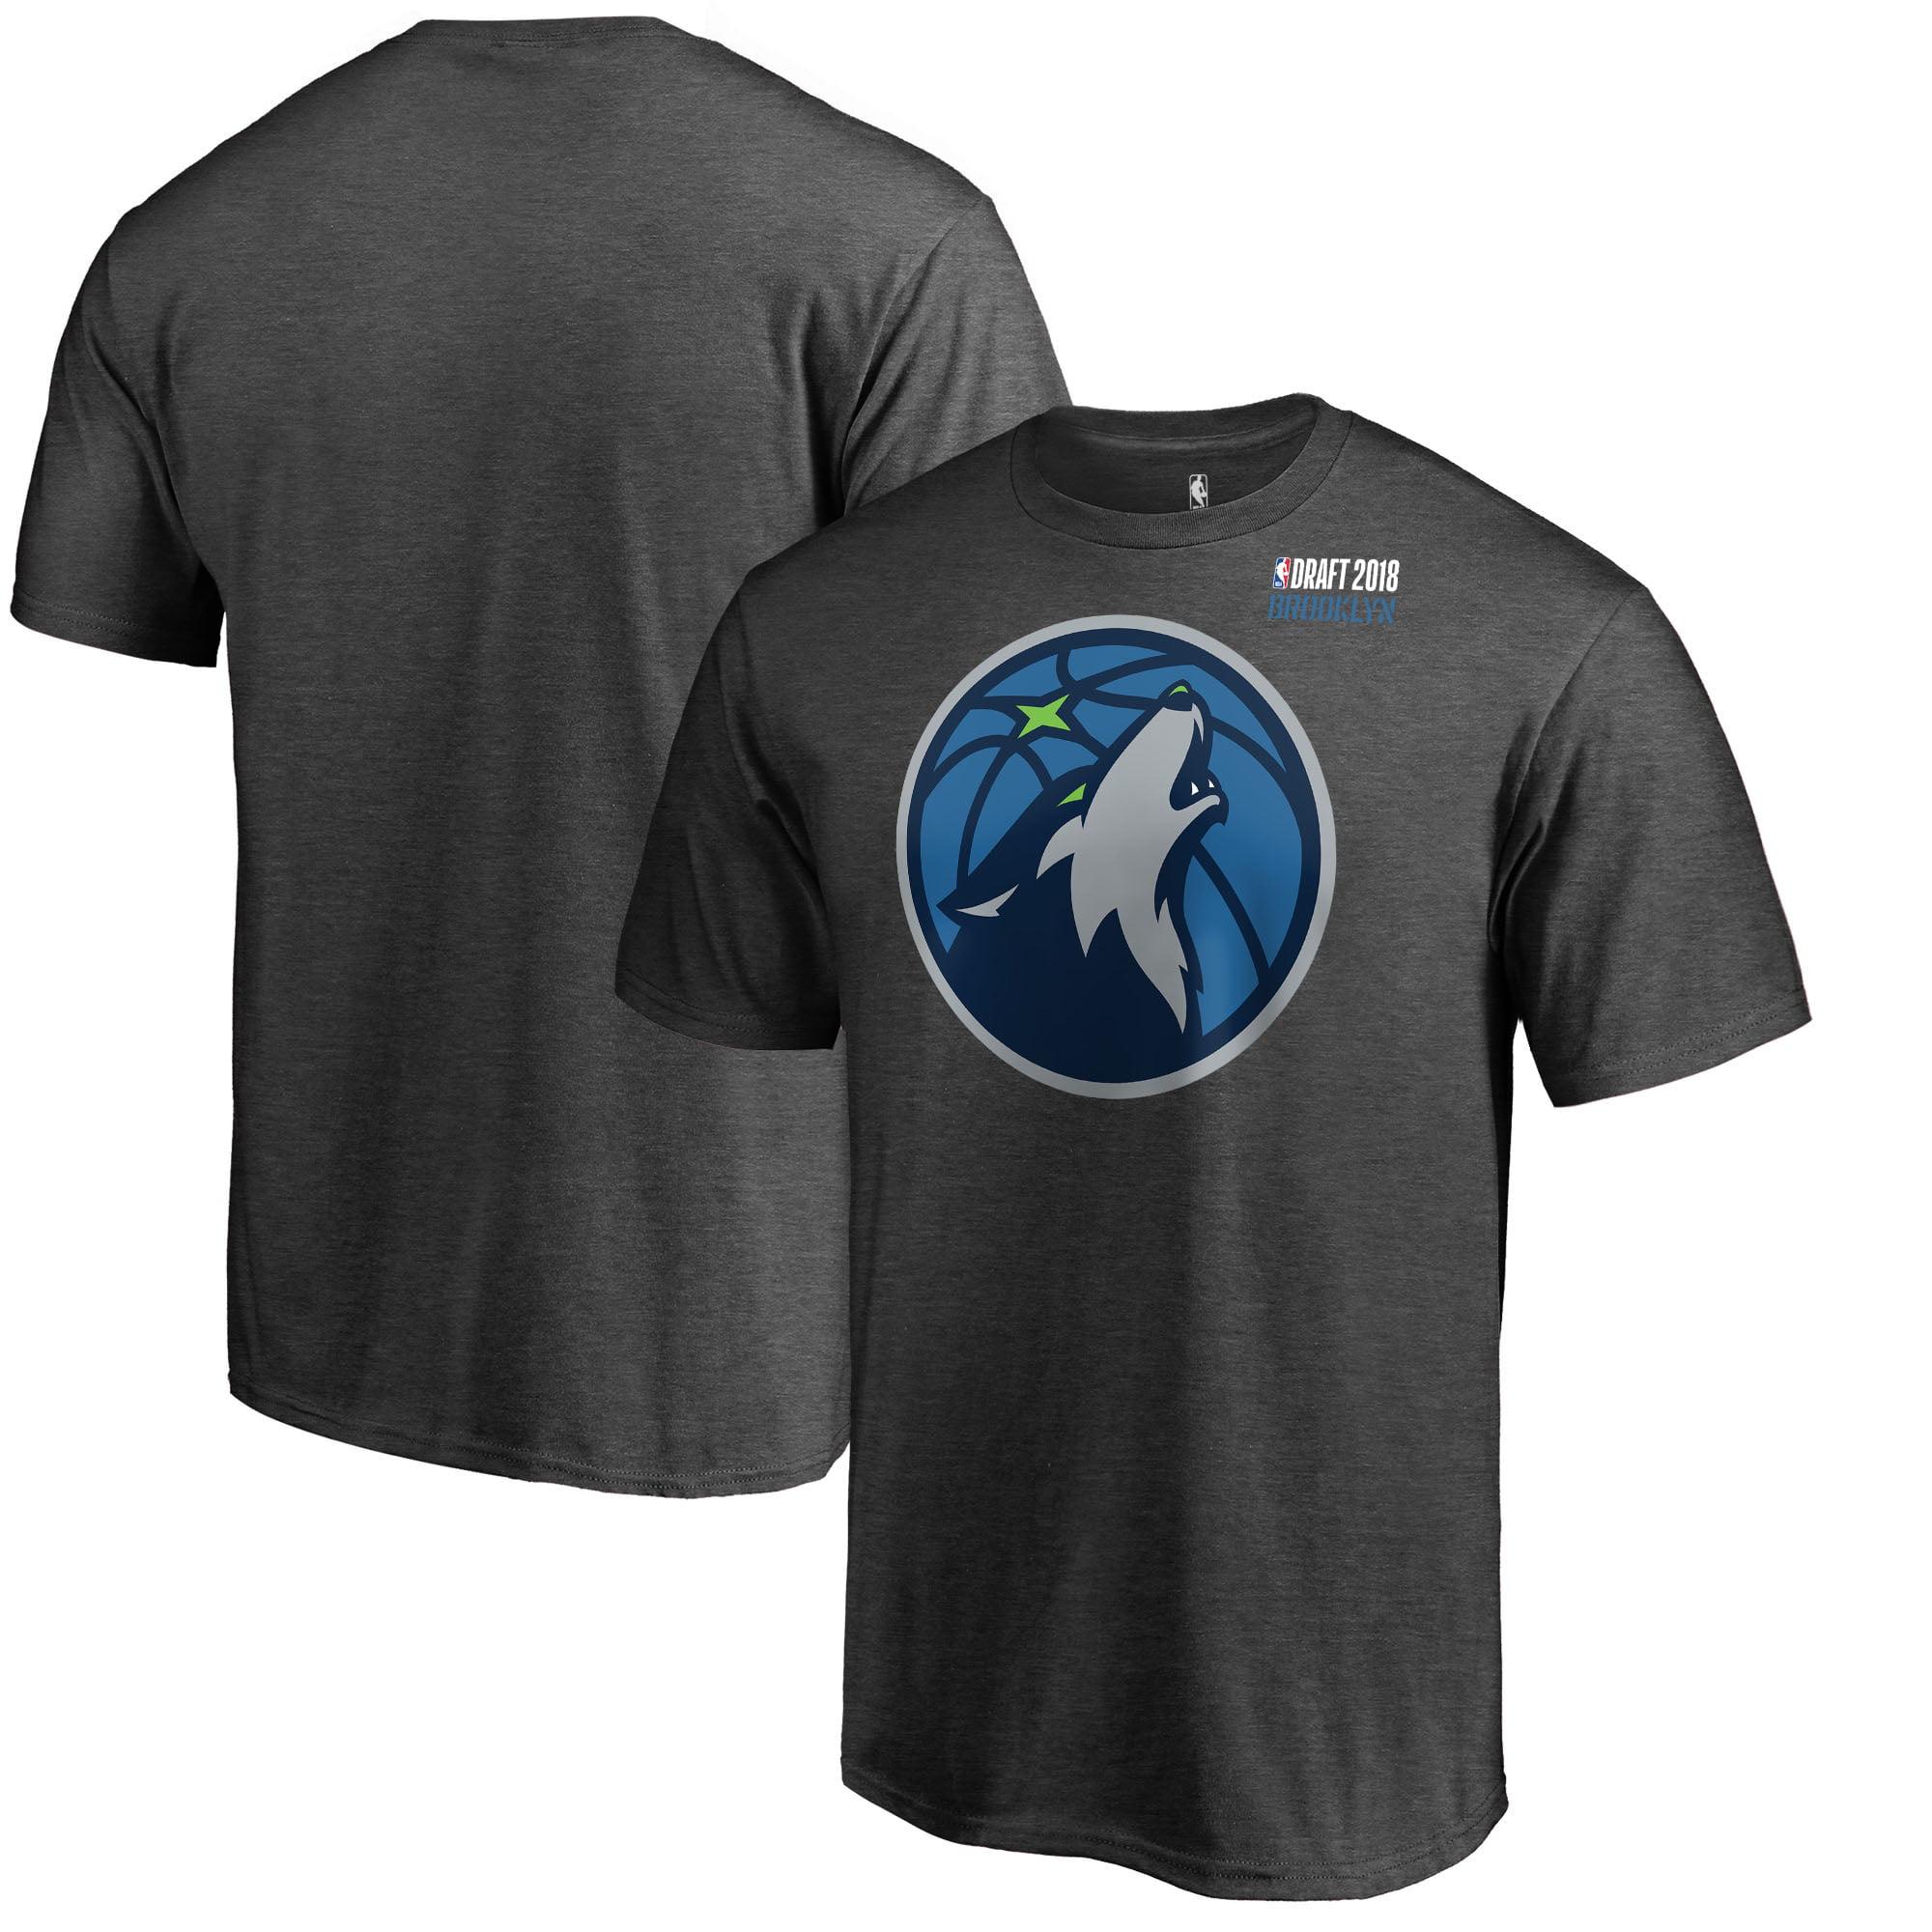 Minnesota Timberwolves Fanatics Branded 2018 NBA Draft BKLYN T-Shirt - Heather Gray